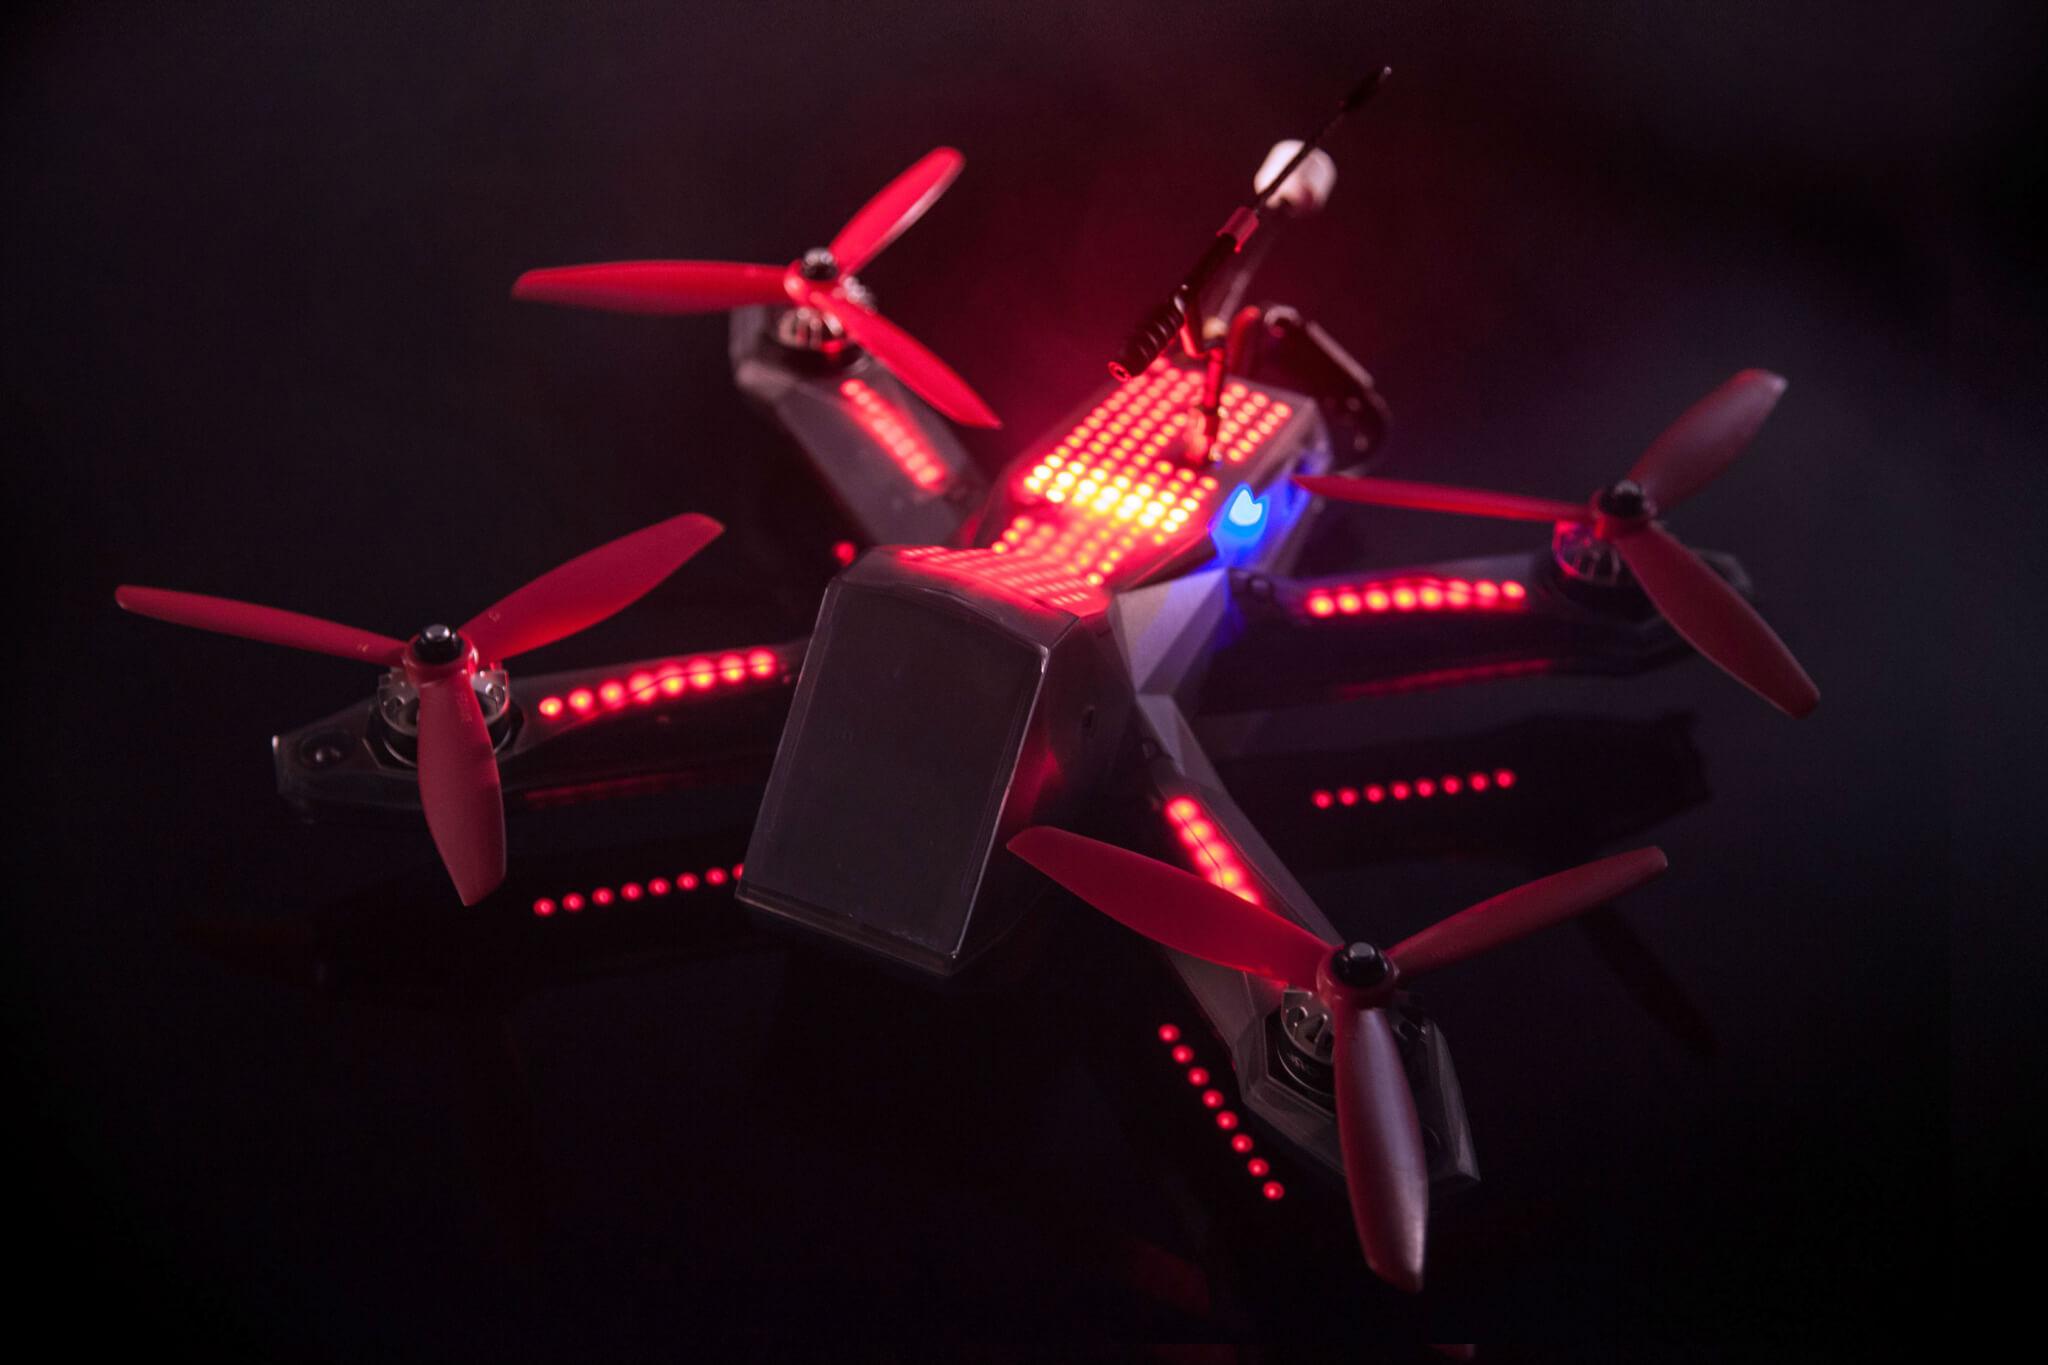 DRL racer 3 R3 Race Drohne Drone FPV Racingquad FPVRacingdrone.de